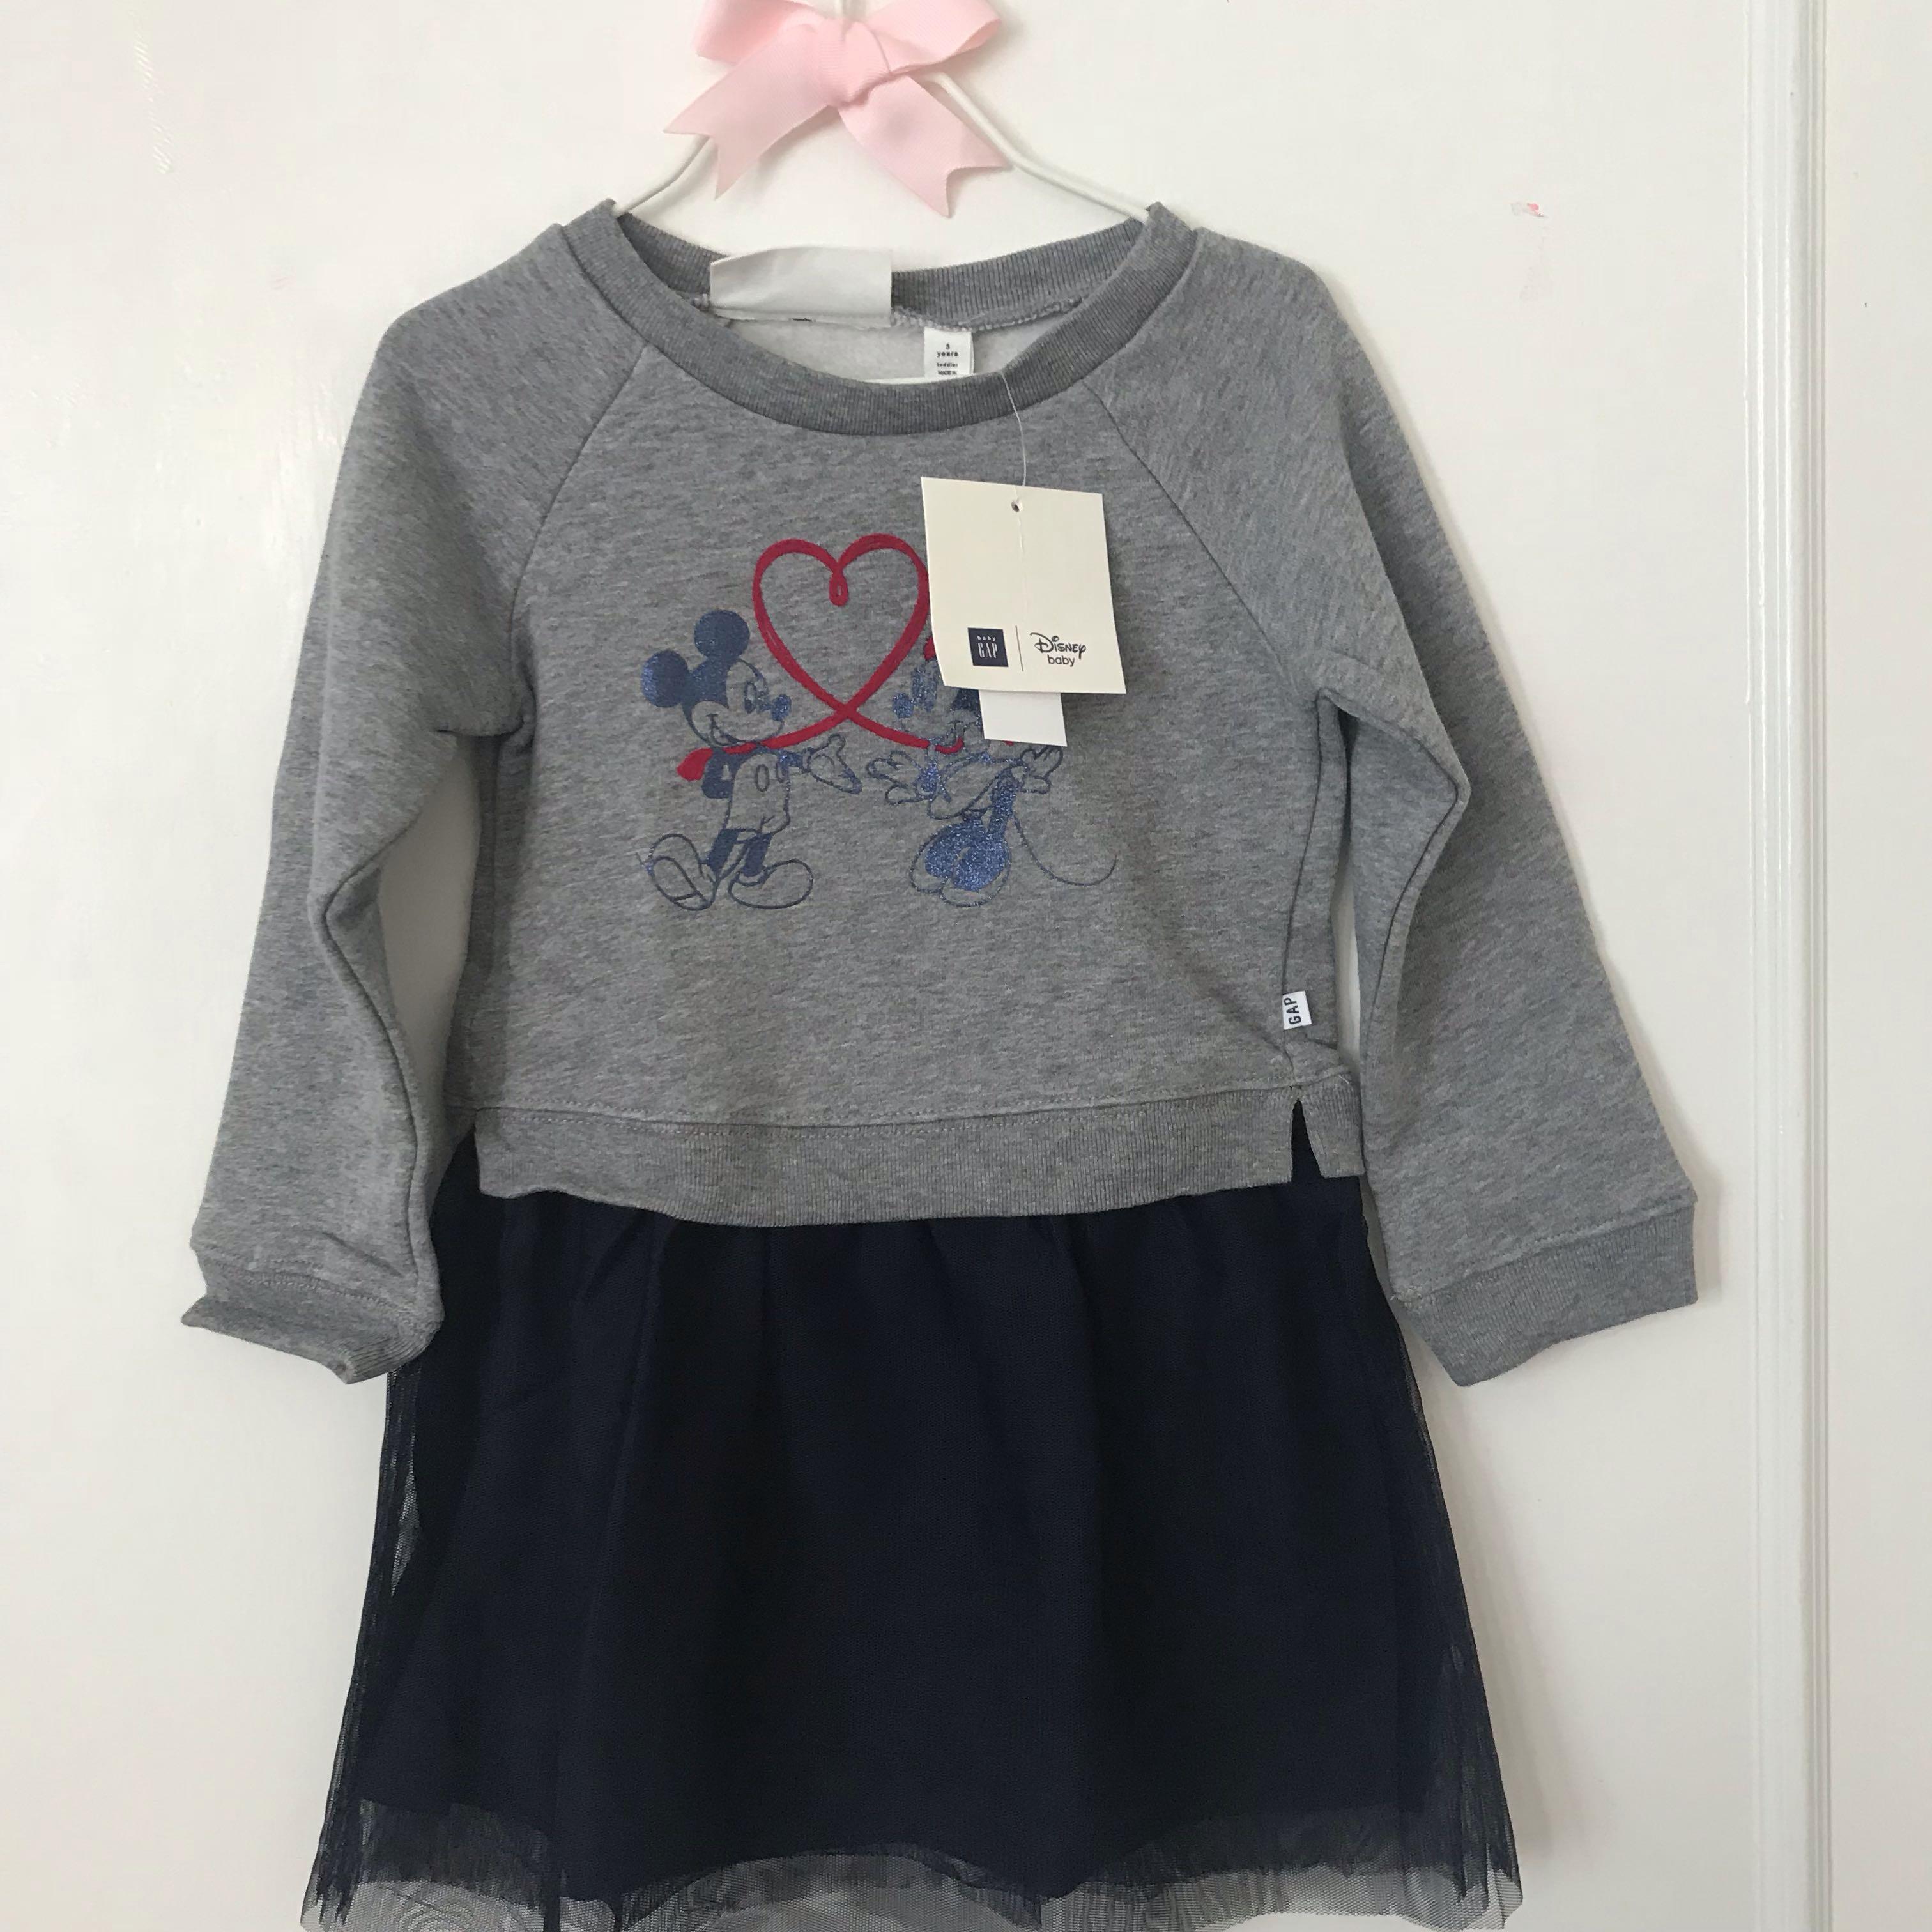 62c39a4ba BN GAP Baby X Disney Minnie Mouse Sweatshirt Tutu Dress 3 years old ...